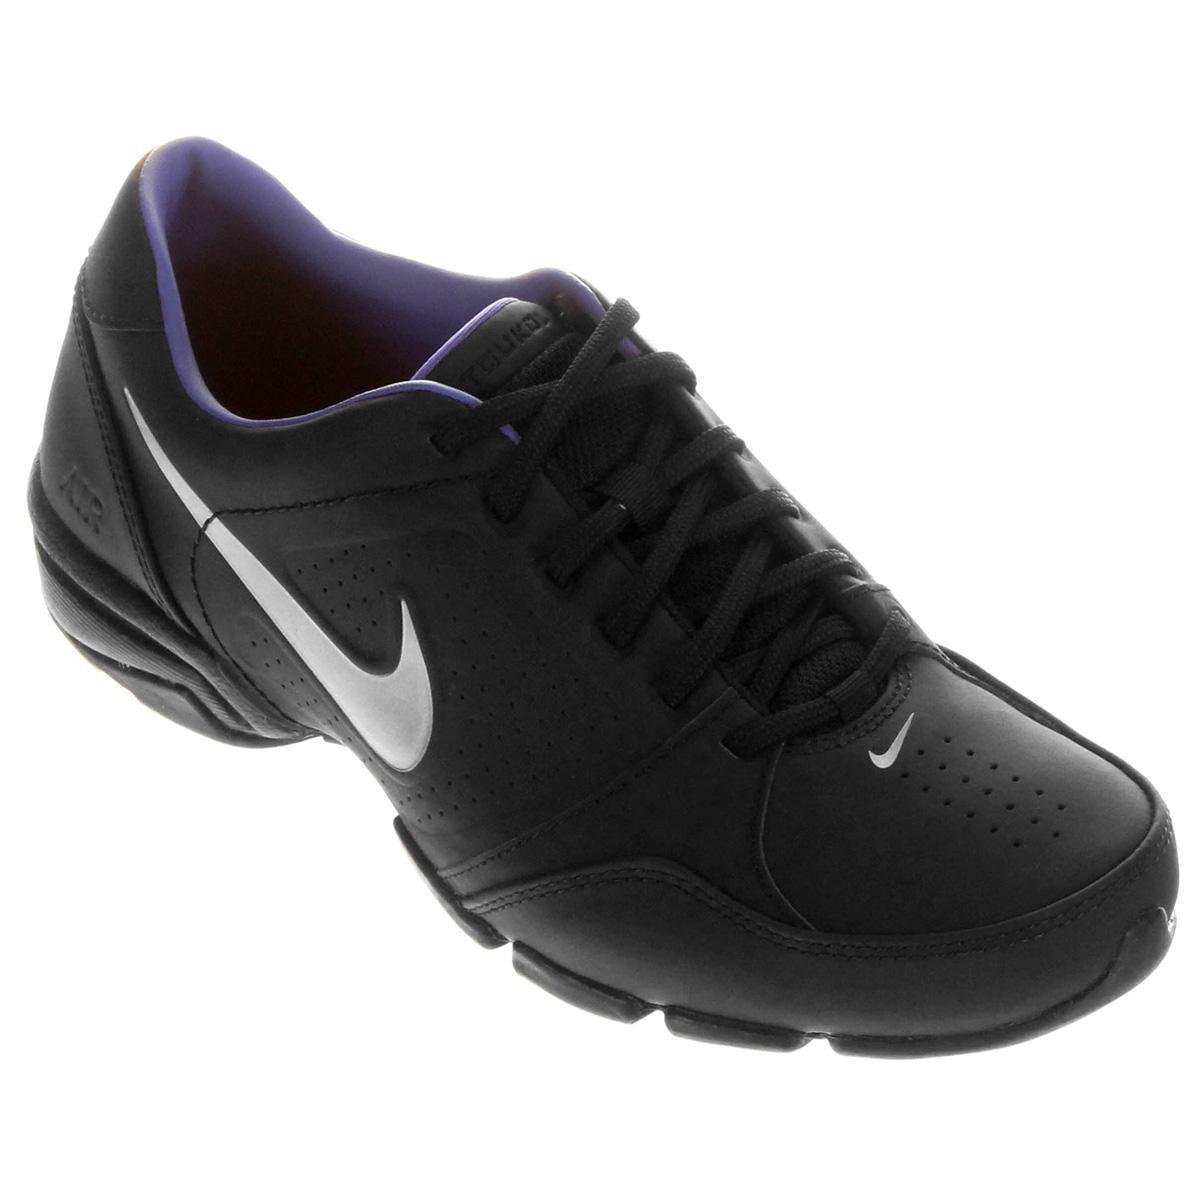 25a9bc44442 Tênis Nike Air Toukol 3 Masculino - Preto e Lilás - Compre Agora ...